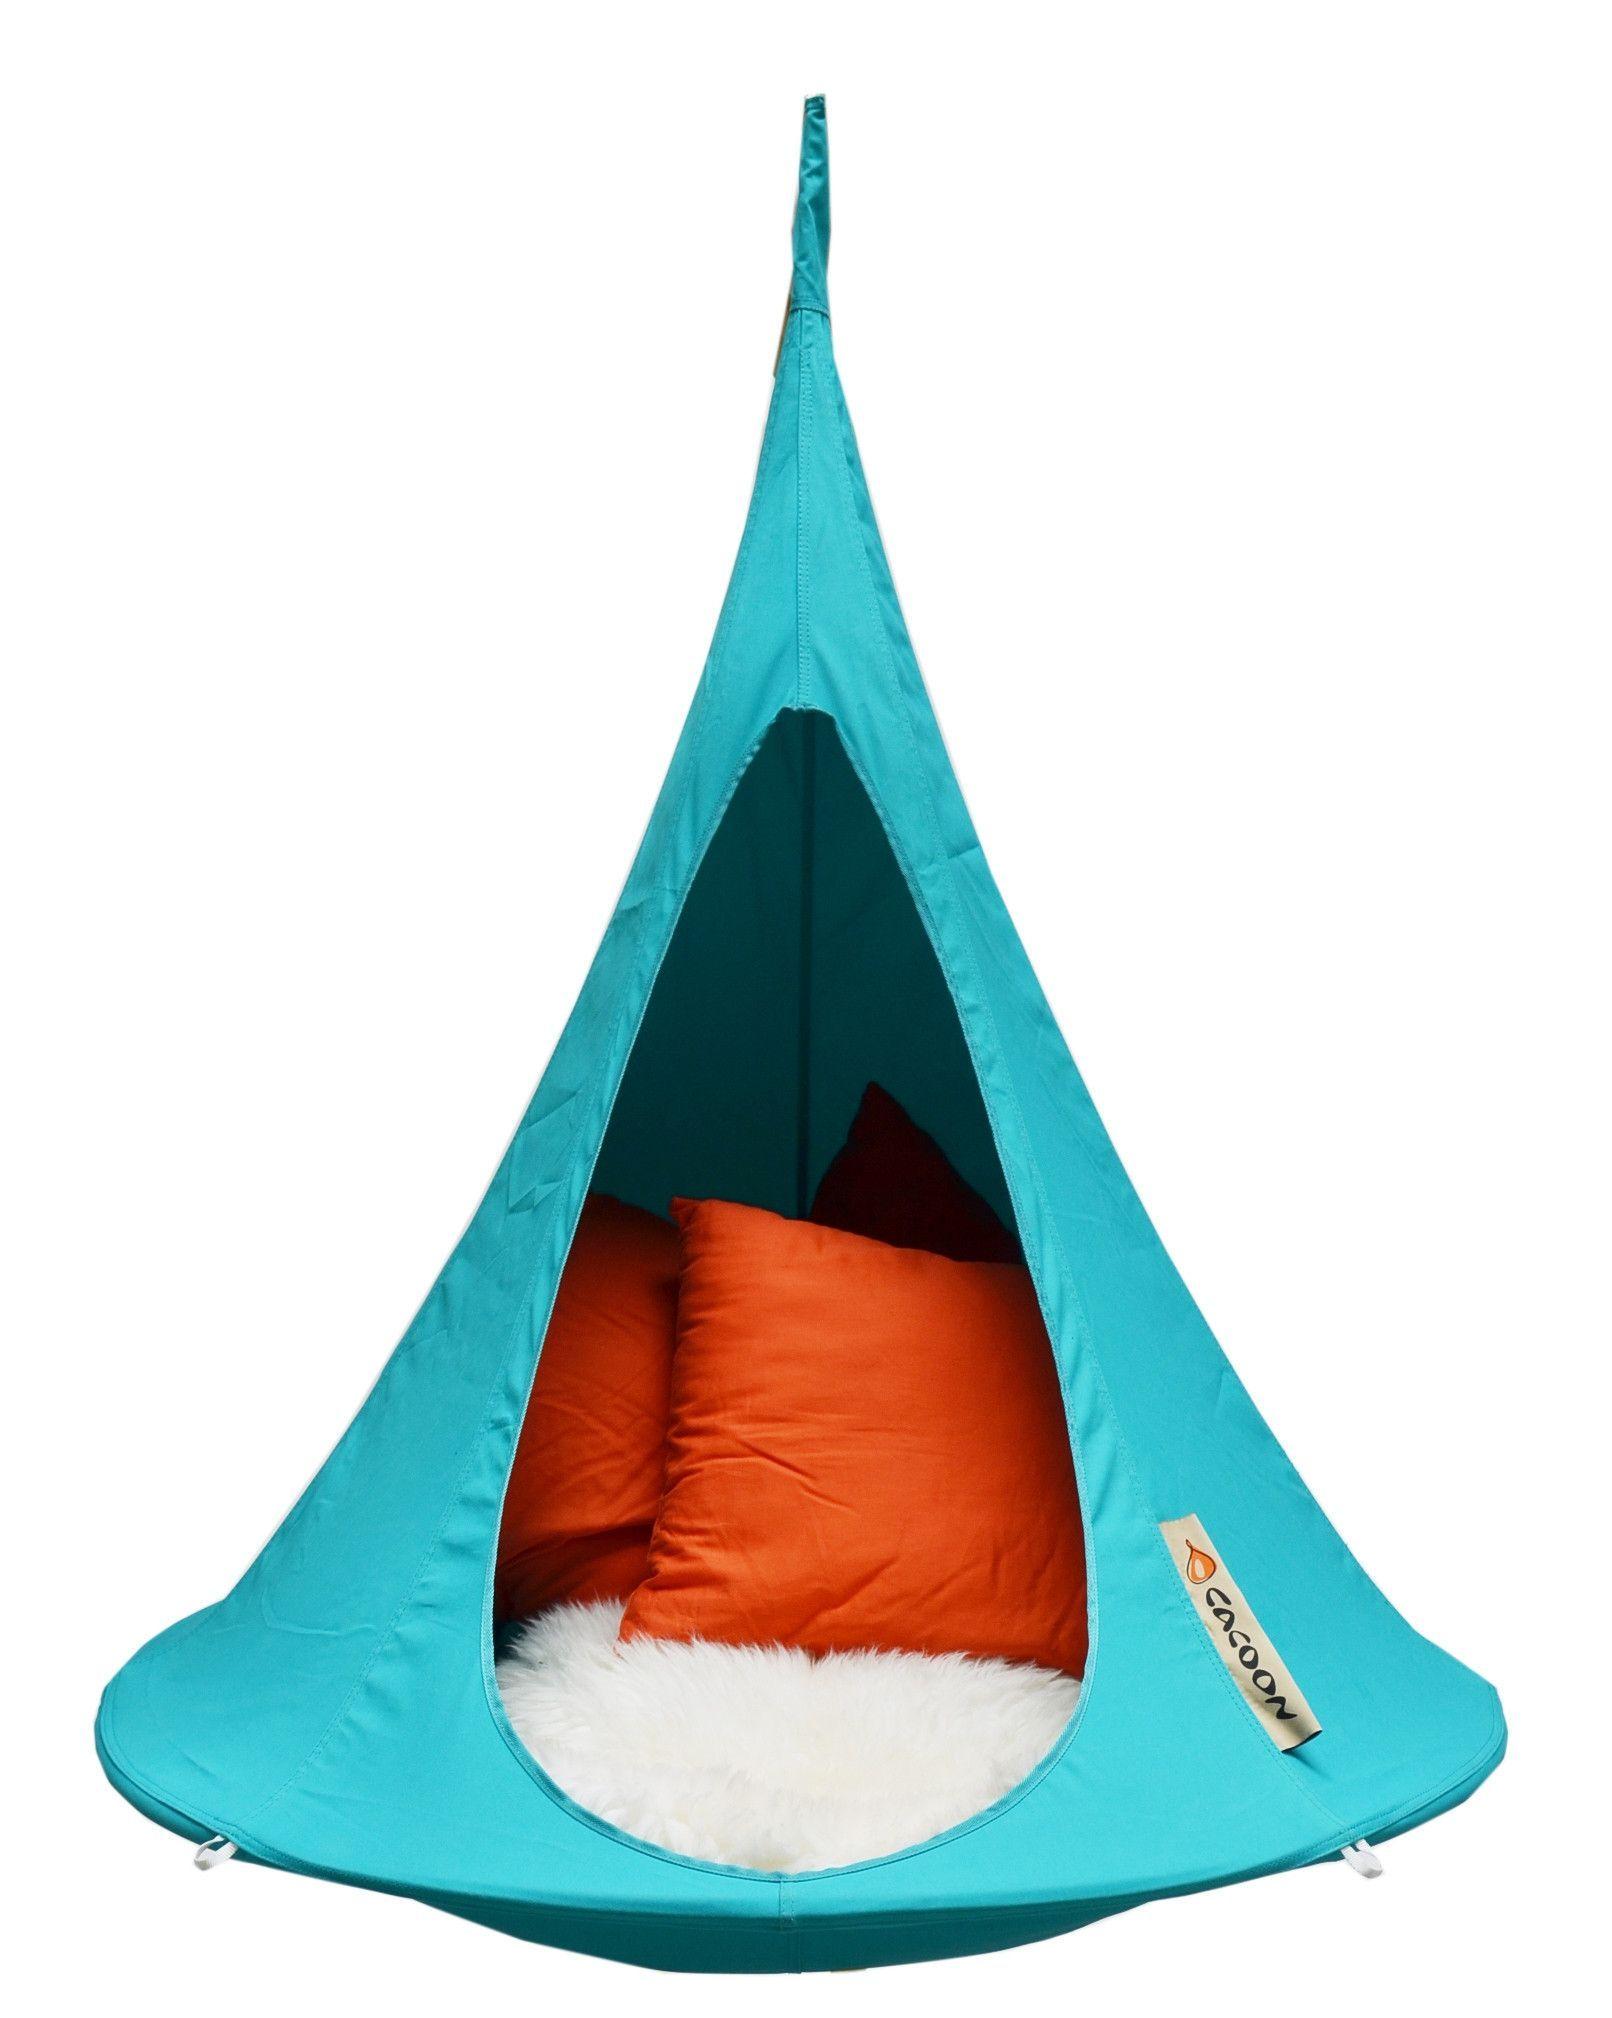 Ikea Ps Svinga Hangstoel.Cacoon Bonsai Hanging Chair Nest Hammock Turquoise Hangstoel